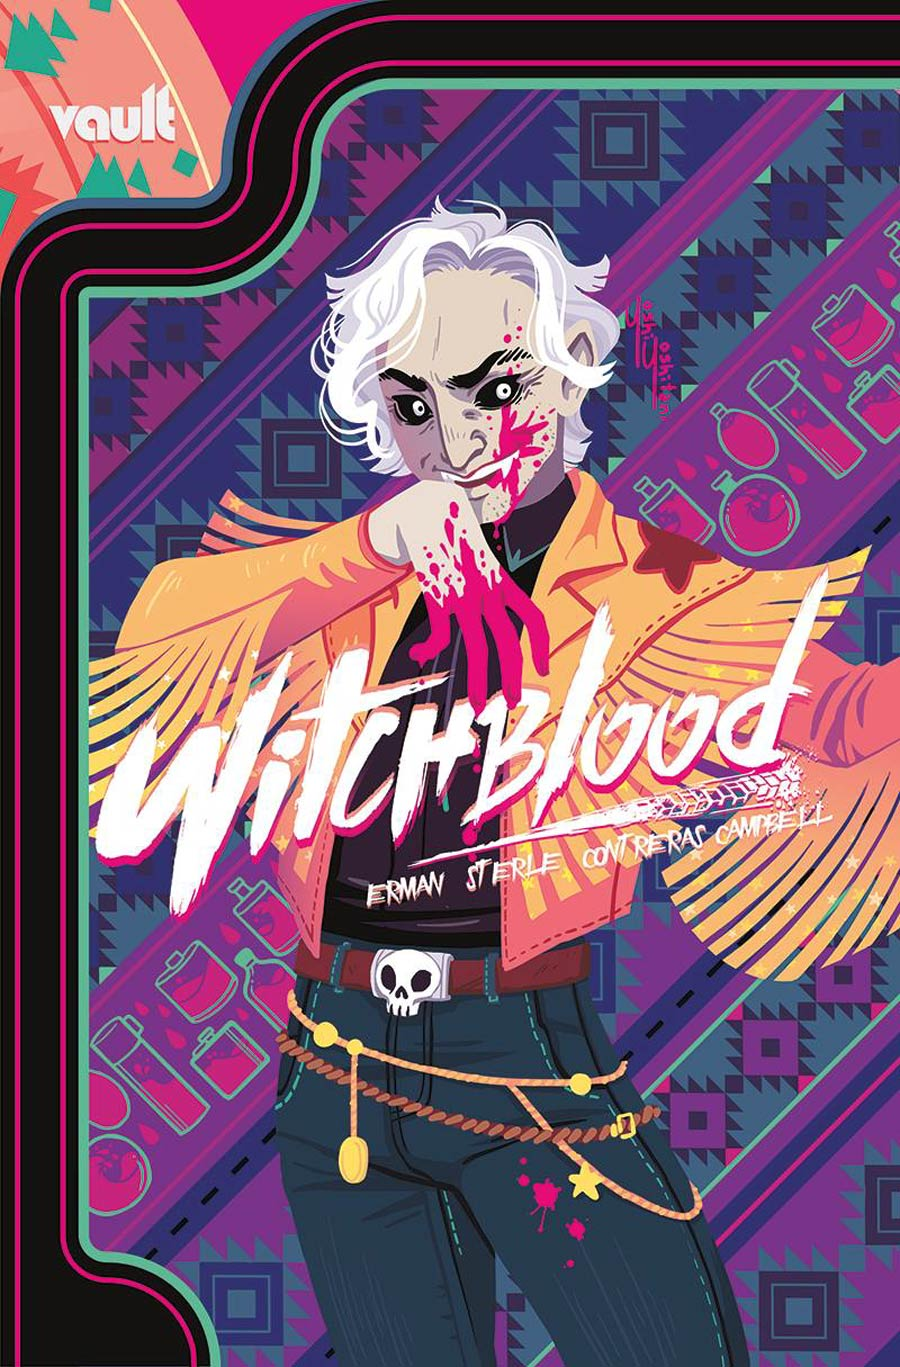 Witchblood #2 Cover C Variant Yoshi Yoshitani Cover